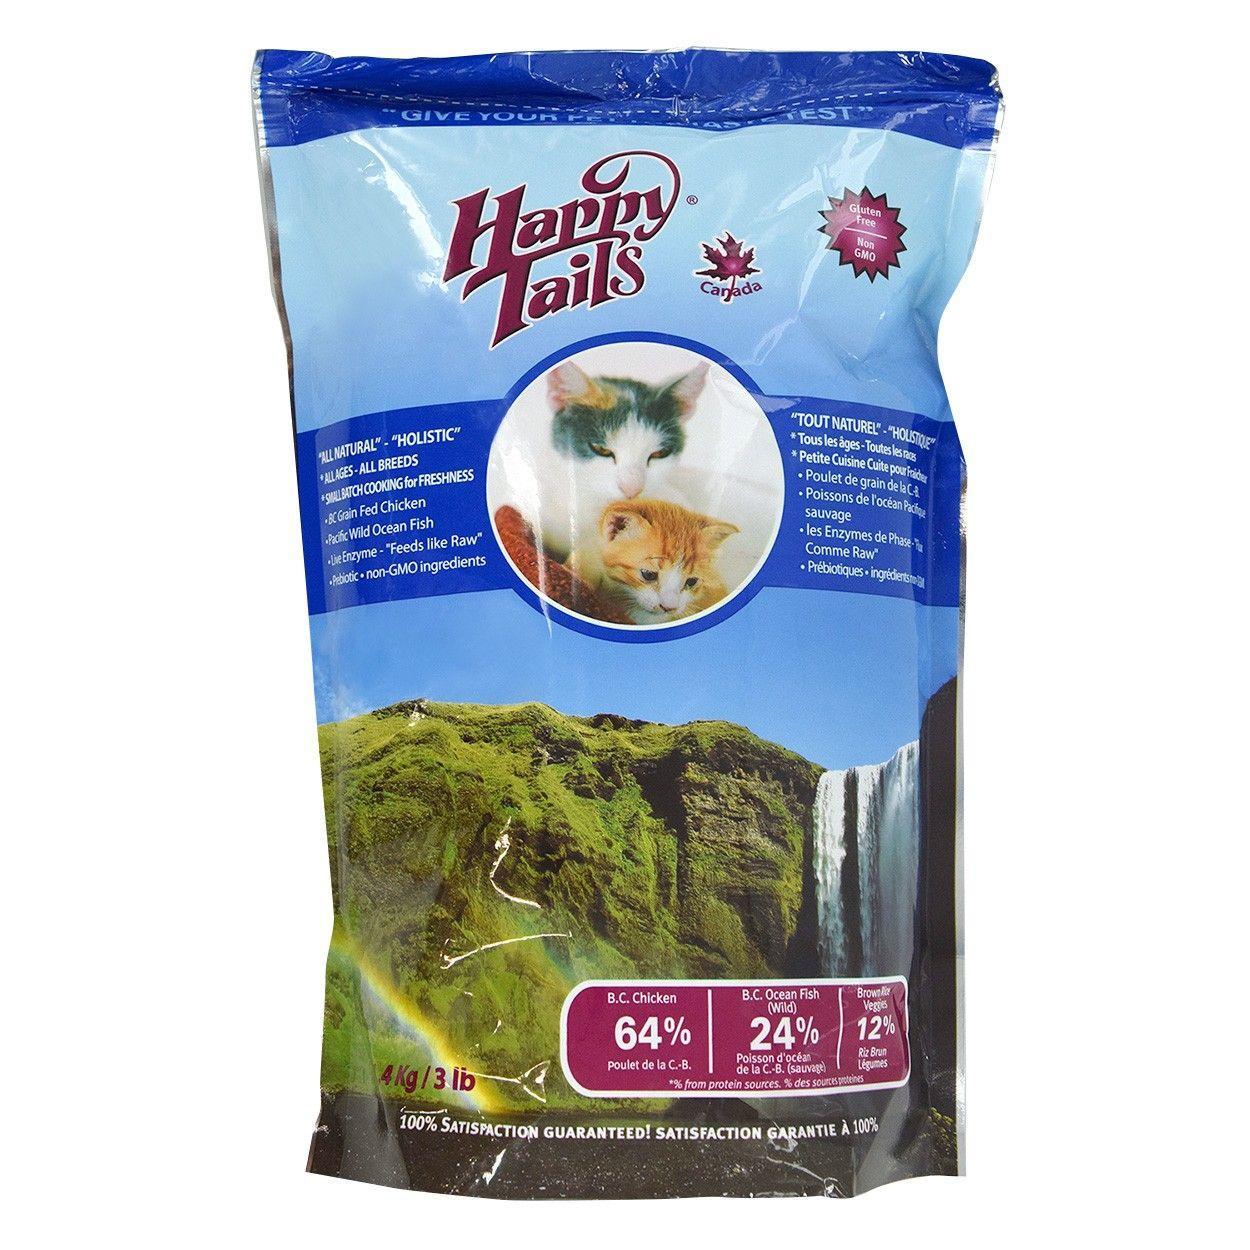 Happy Tails Holistic Dry Cat Food, 7-lb